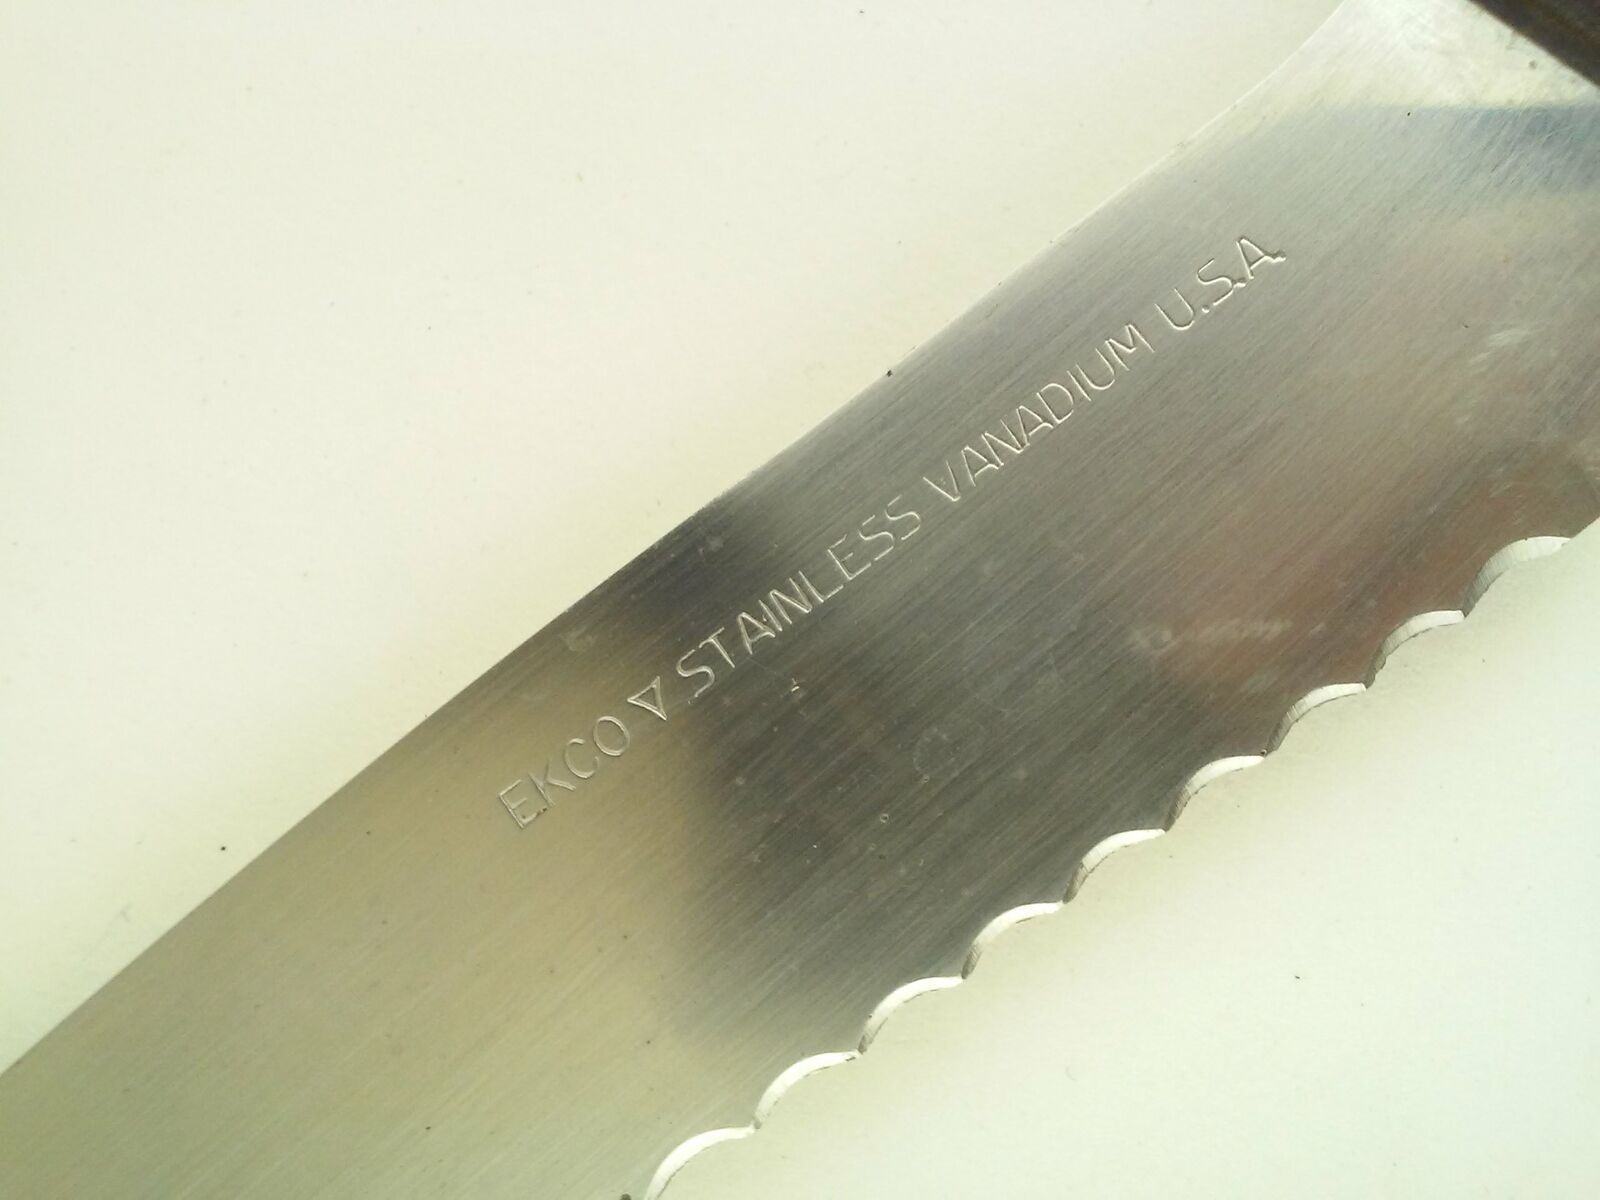 Ekco Offset Handle Stainless Vanadium Slicer Serving Cheese Knife